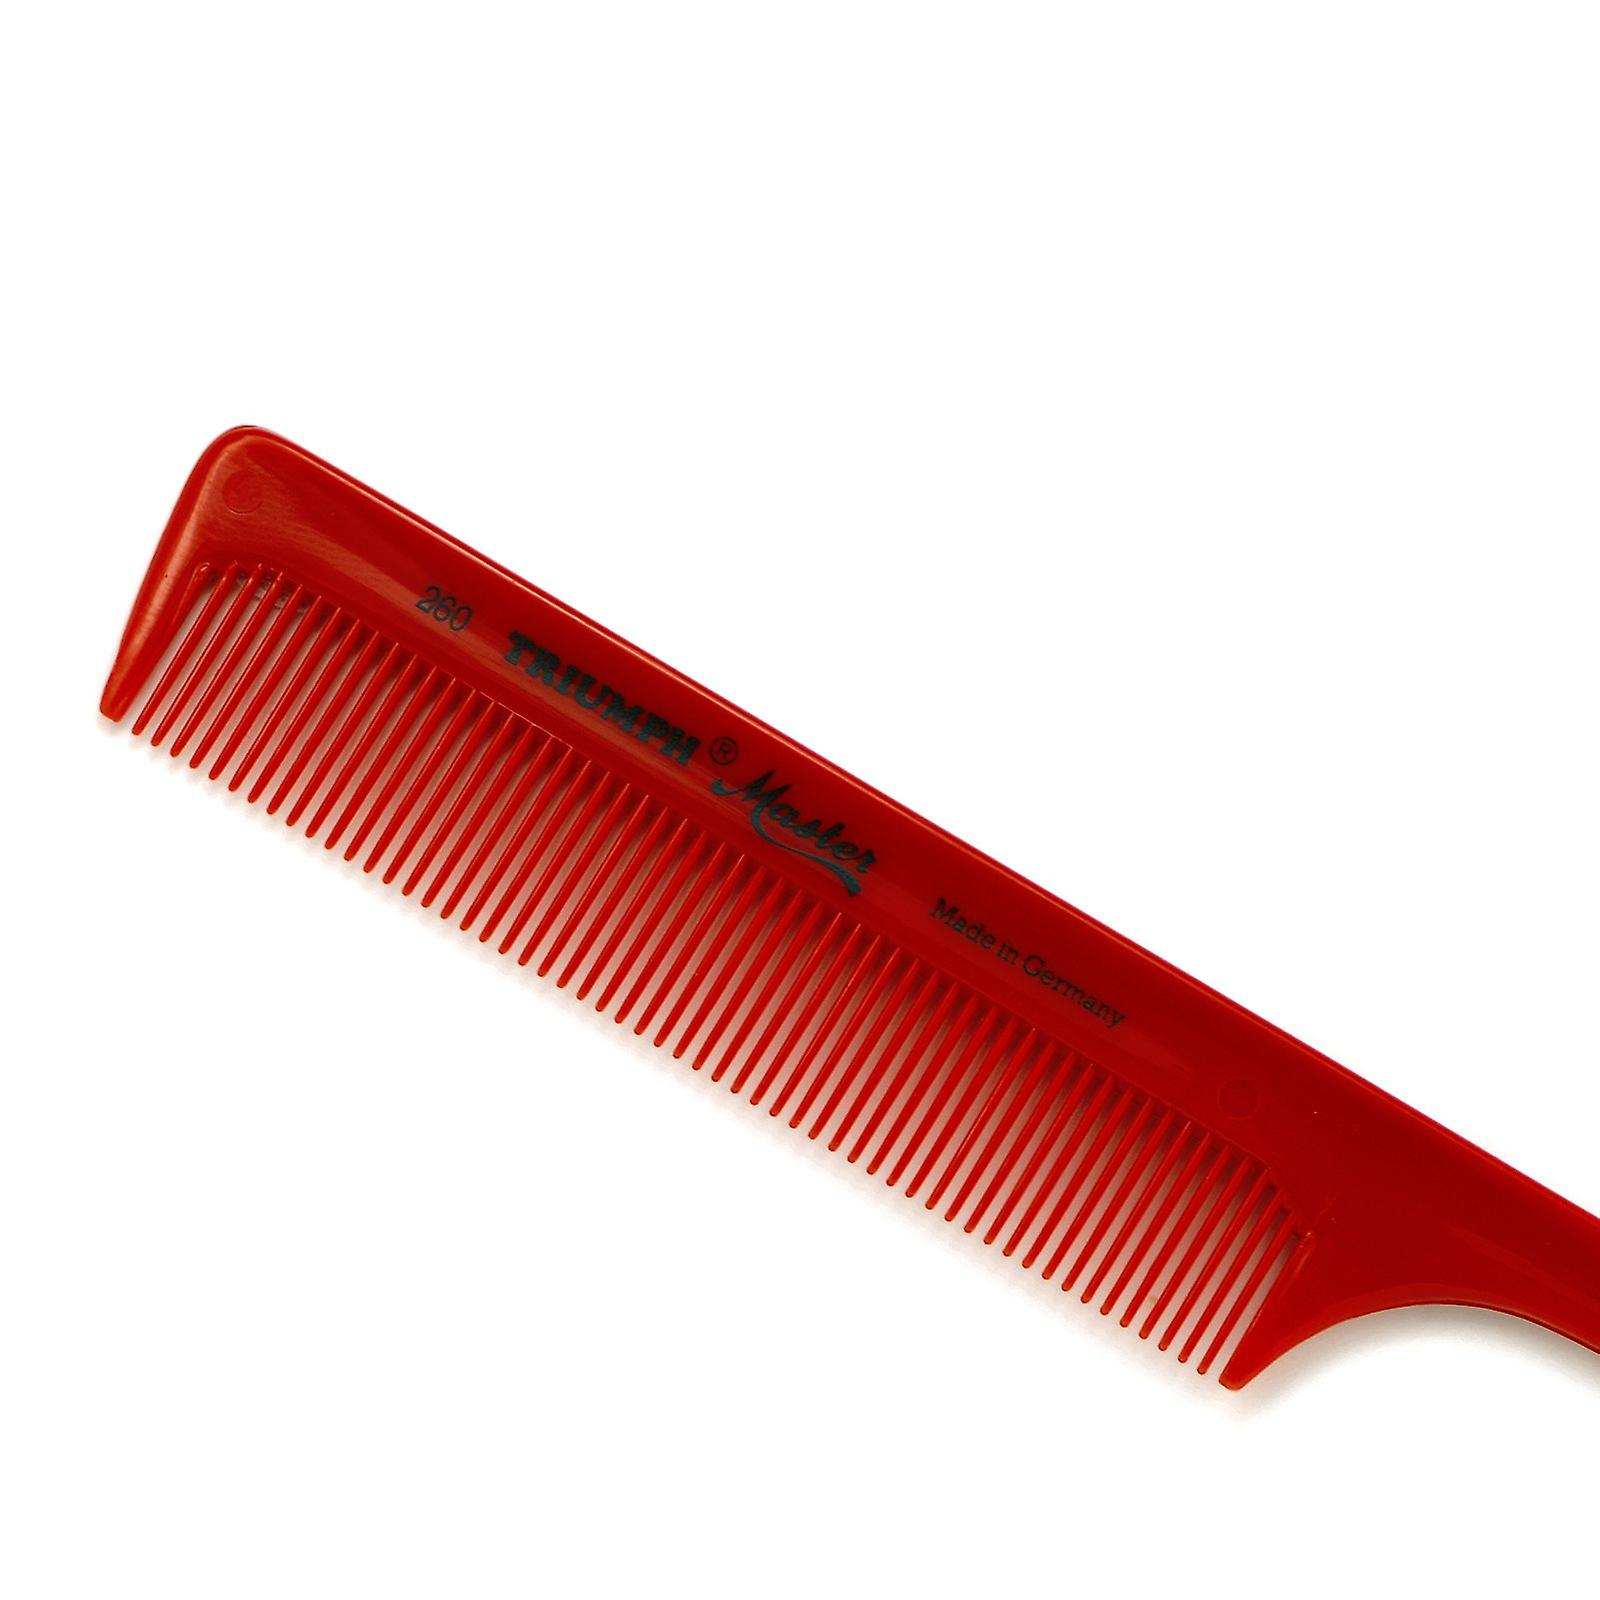 Triumph Master tail comb  HS-260 15